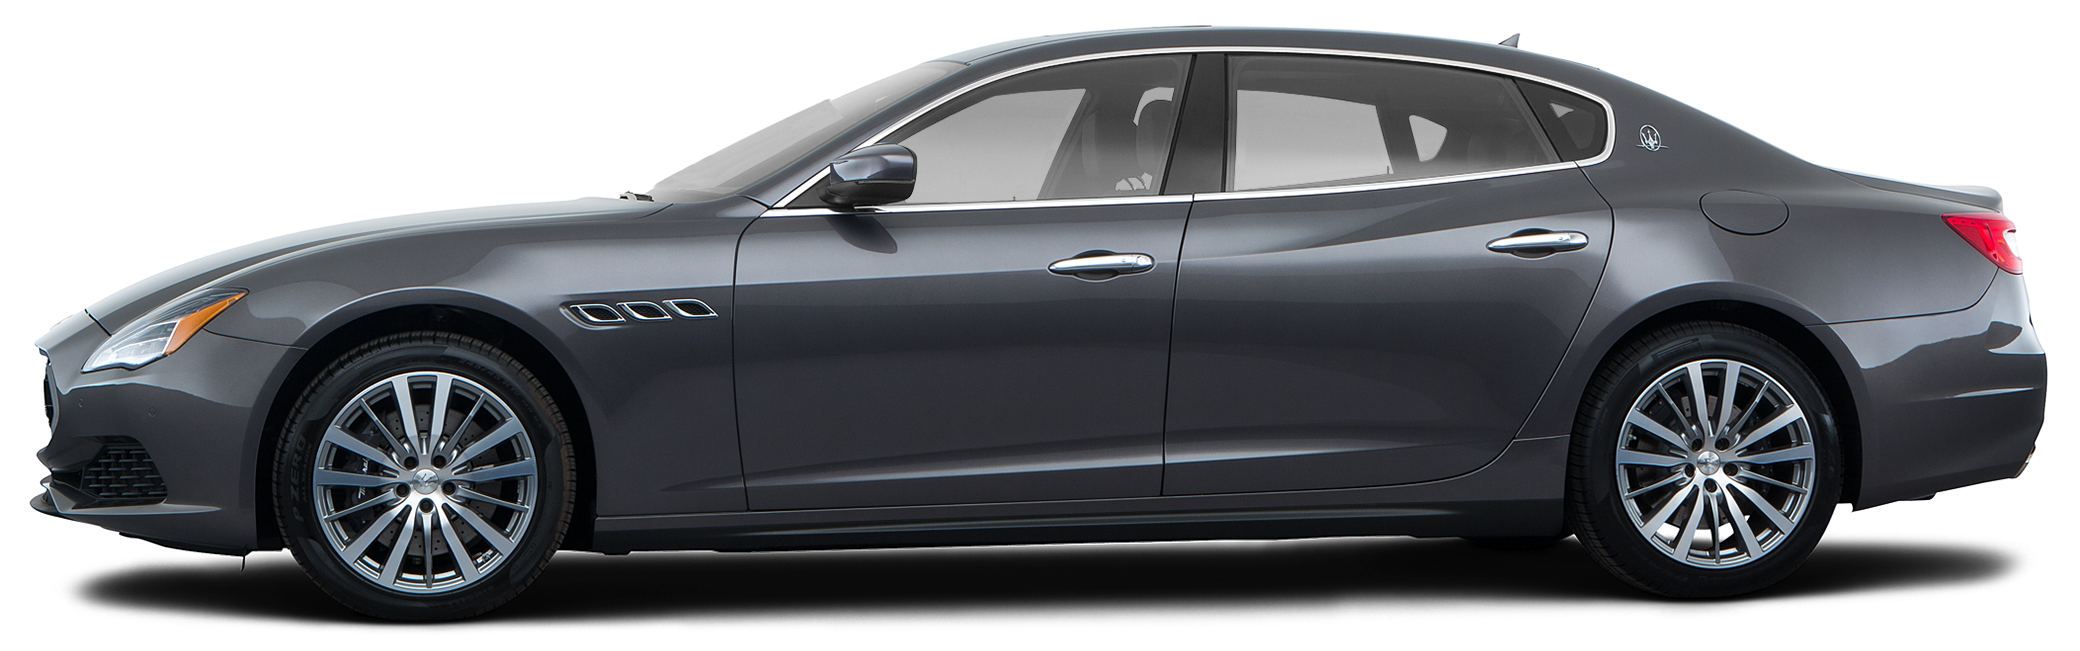 2019 Maserati Quattroporte Sedan S